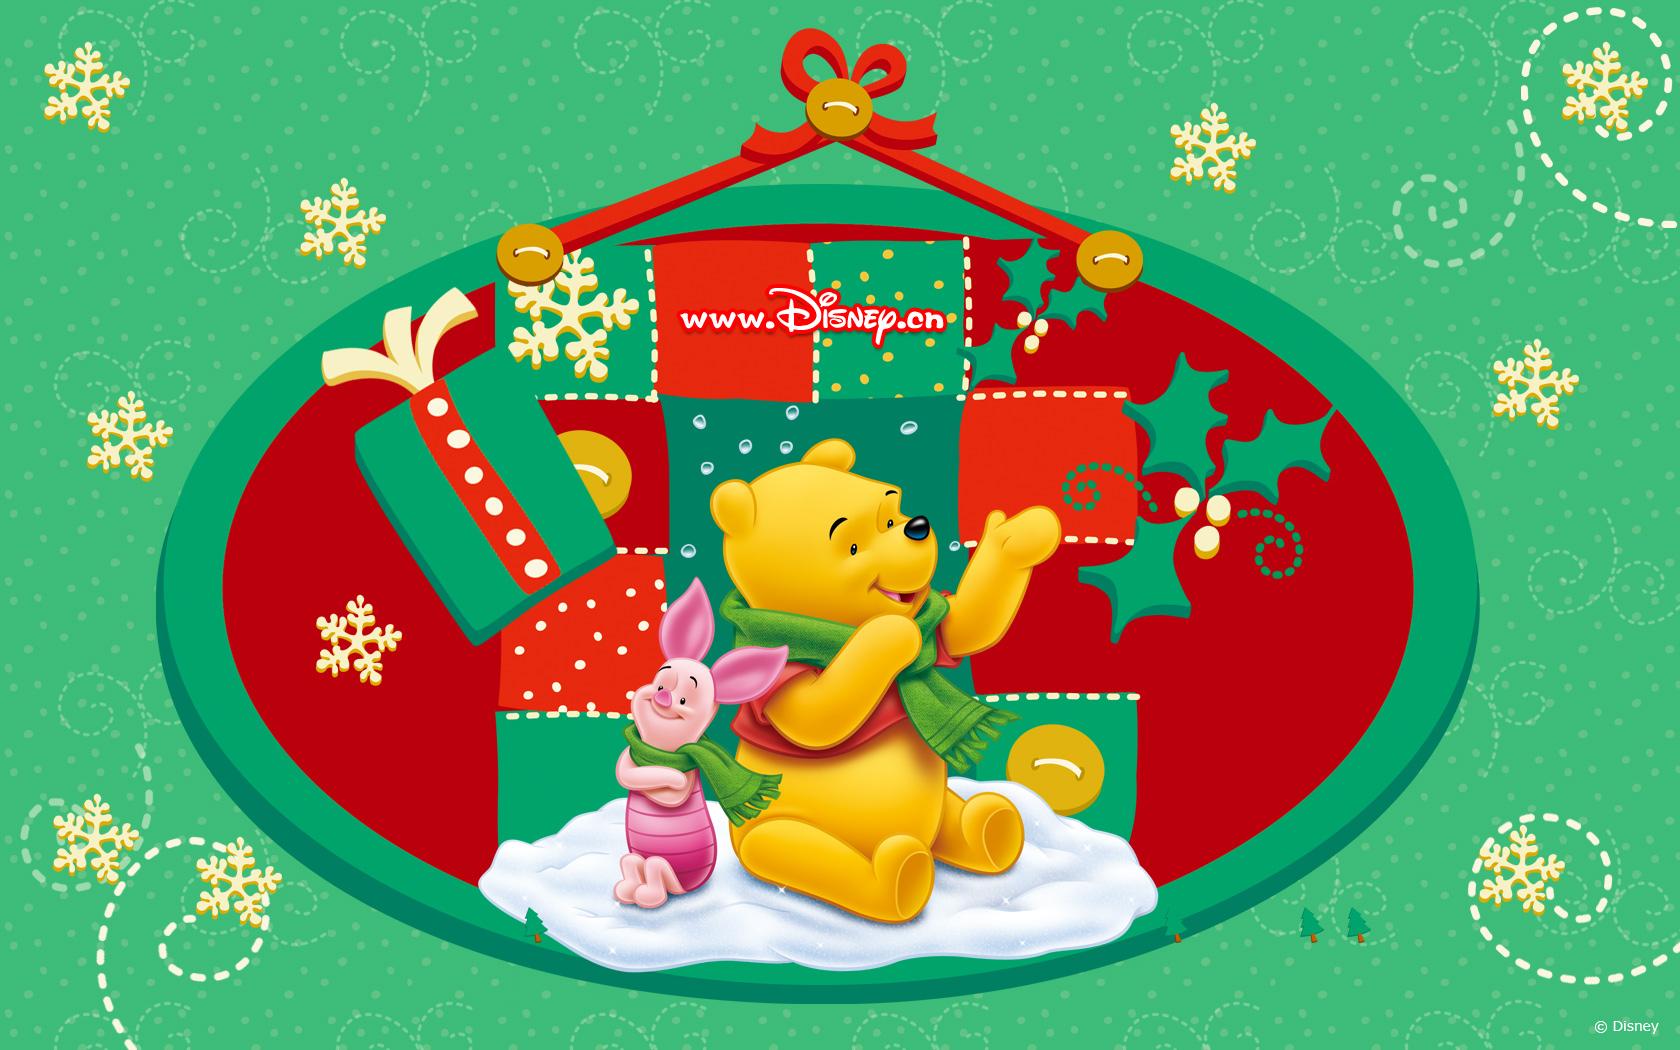 Cartoons Wallpapers Winnie The Pooh 14